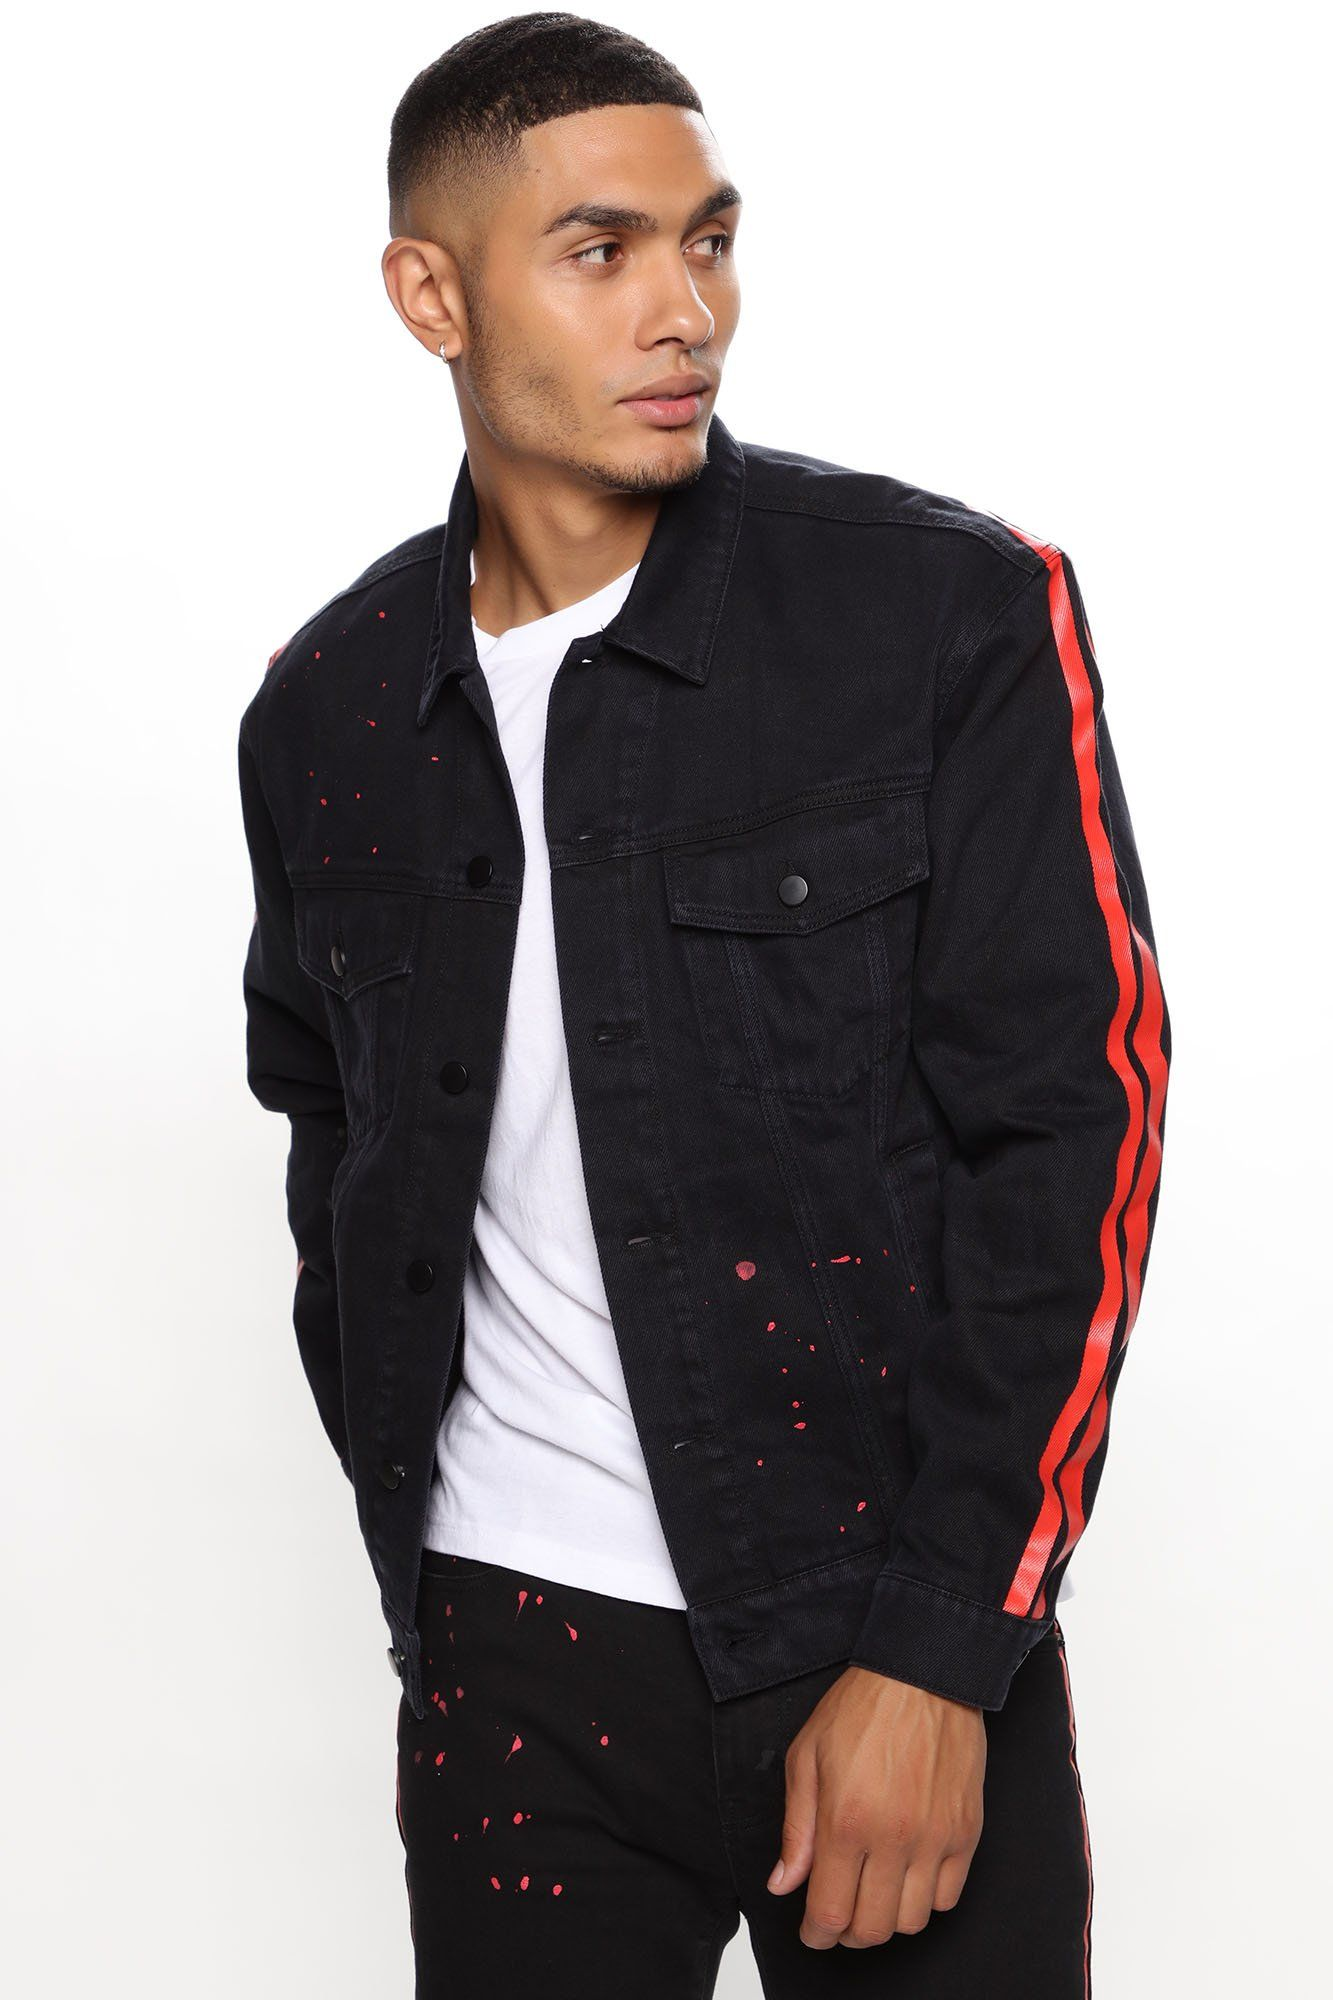 Vance Denim Jacket Black Red In 2021 Black Denim Jacket Black Denim Jacket Men Denim Jacket [ 2000 x 1333 Pixel ]